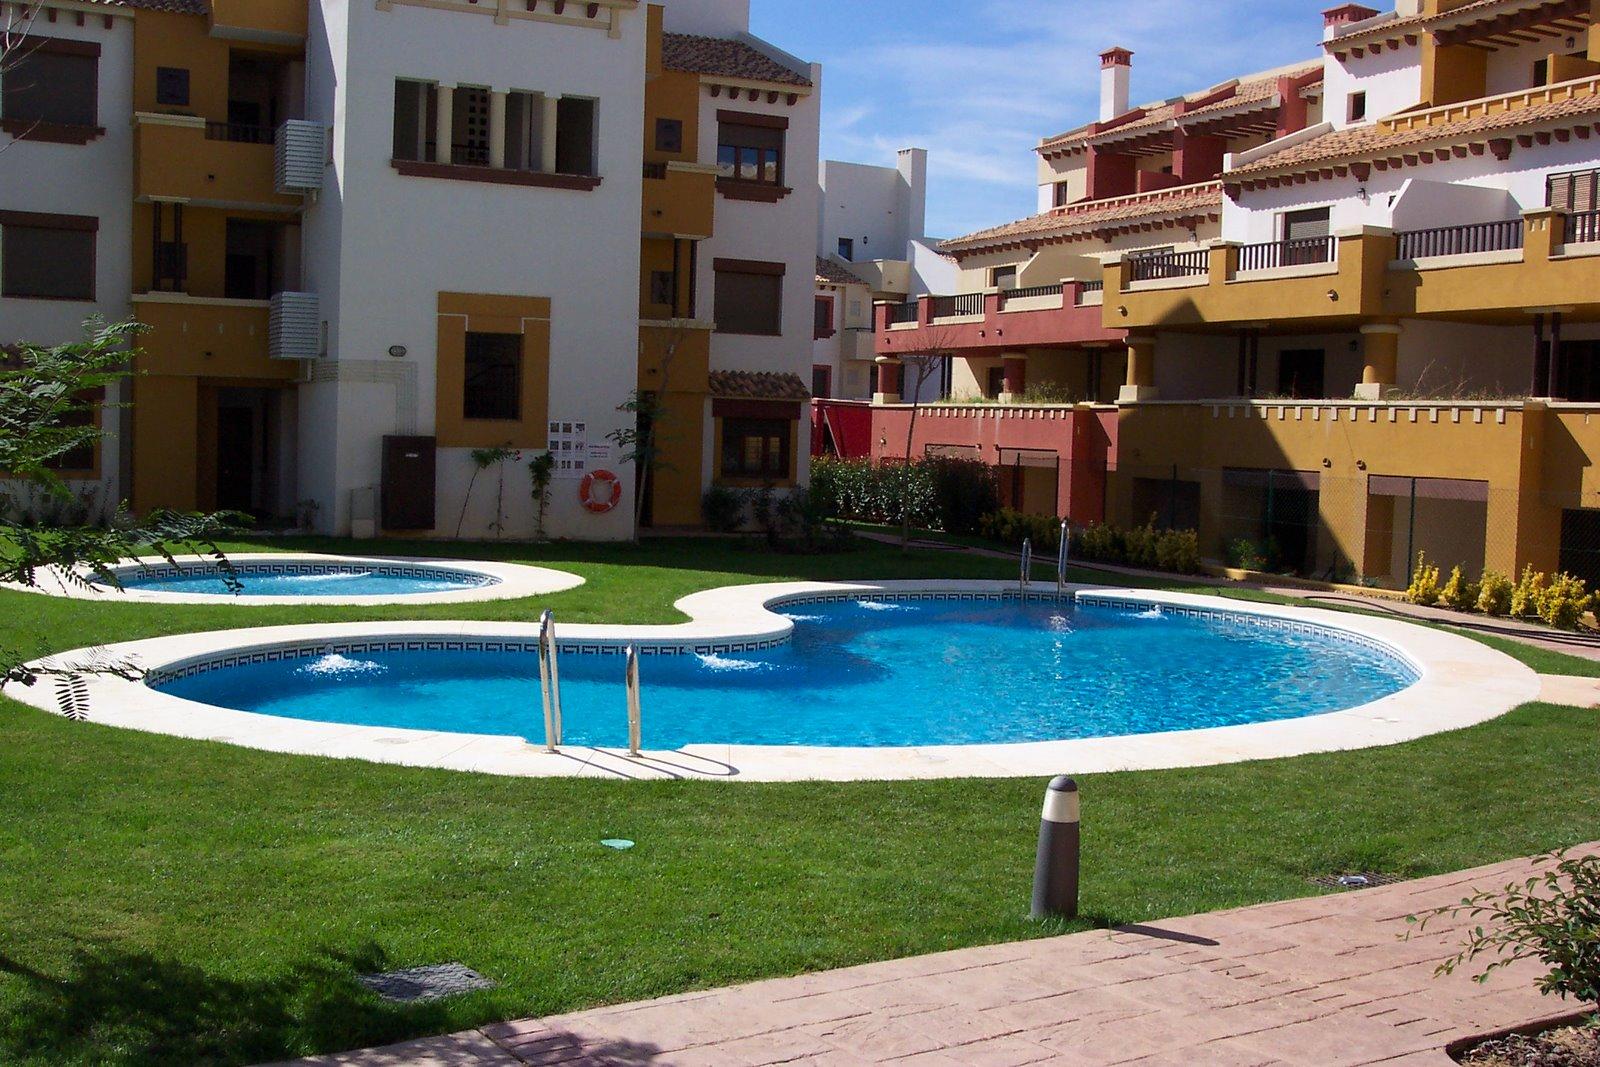 mantenimiento de piscinas en huelva siempreverde jardiner a